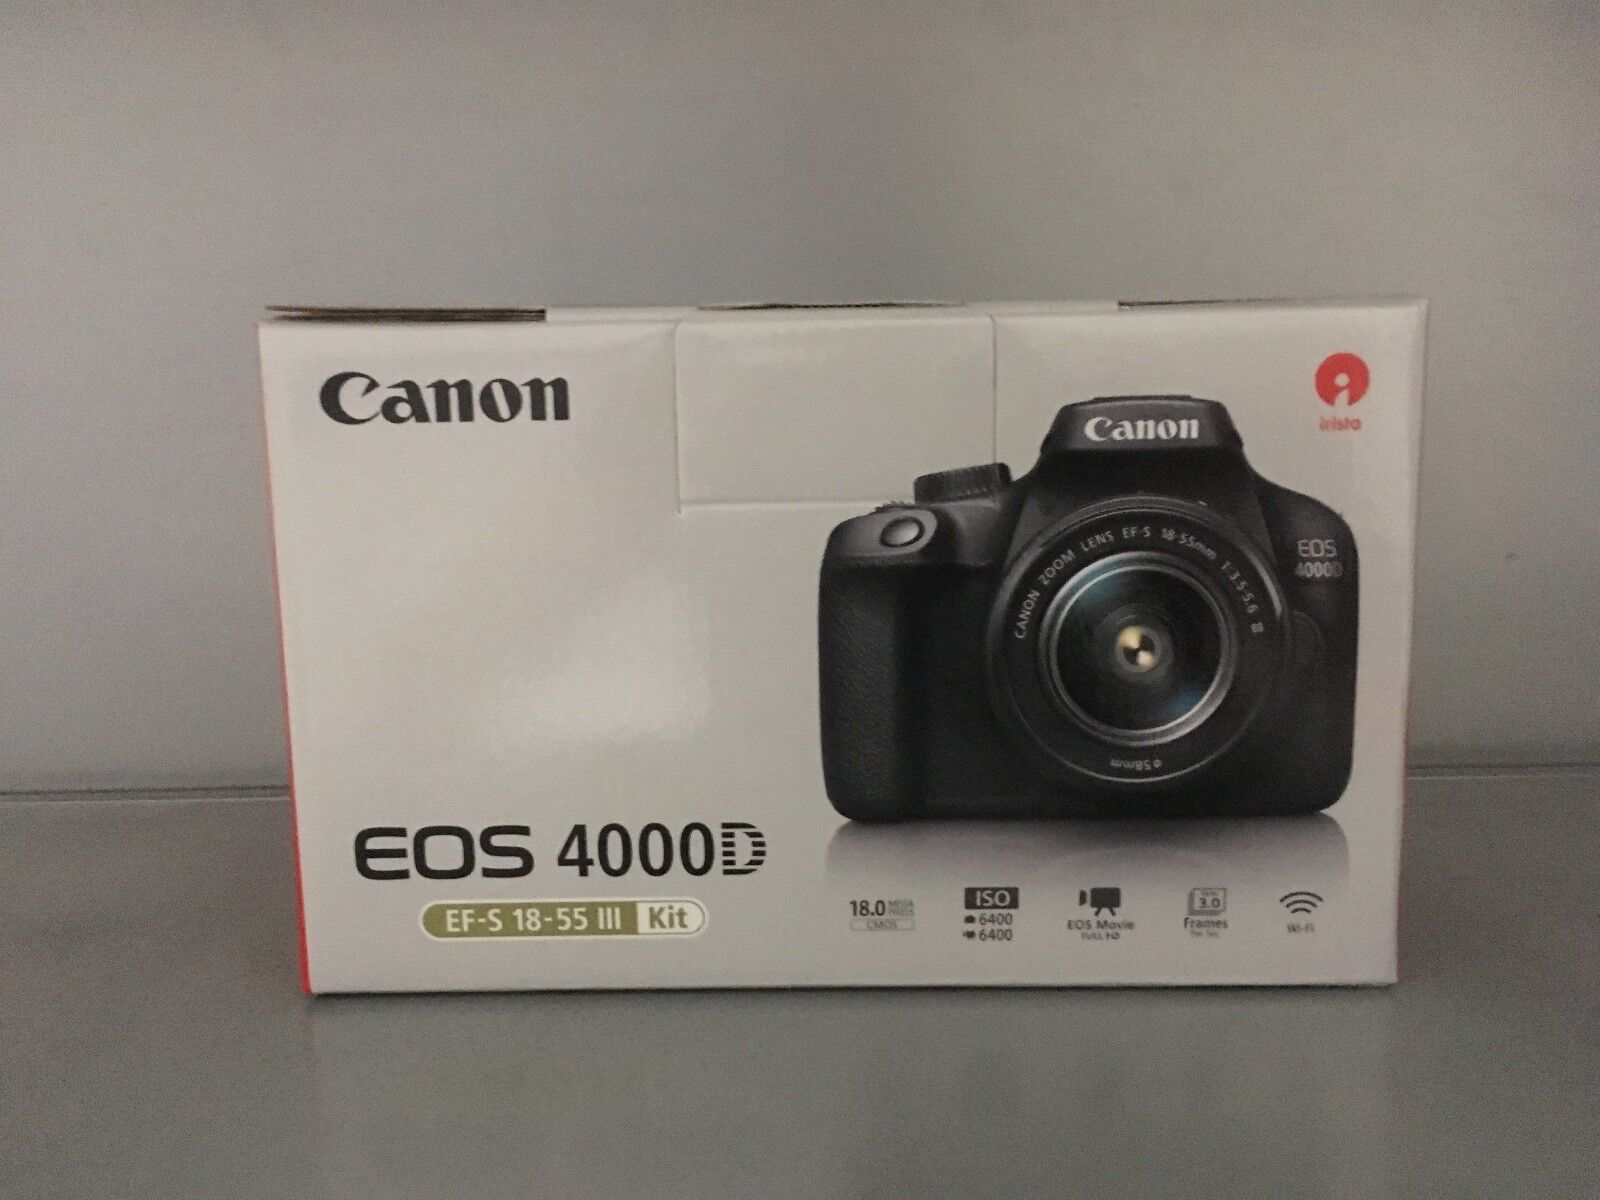 CANON EOS 4000D Kit Spiegelreflexkamera 18MP mit Objektiv 18-55 mm f/5.6 Wlan ❌